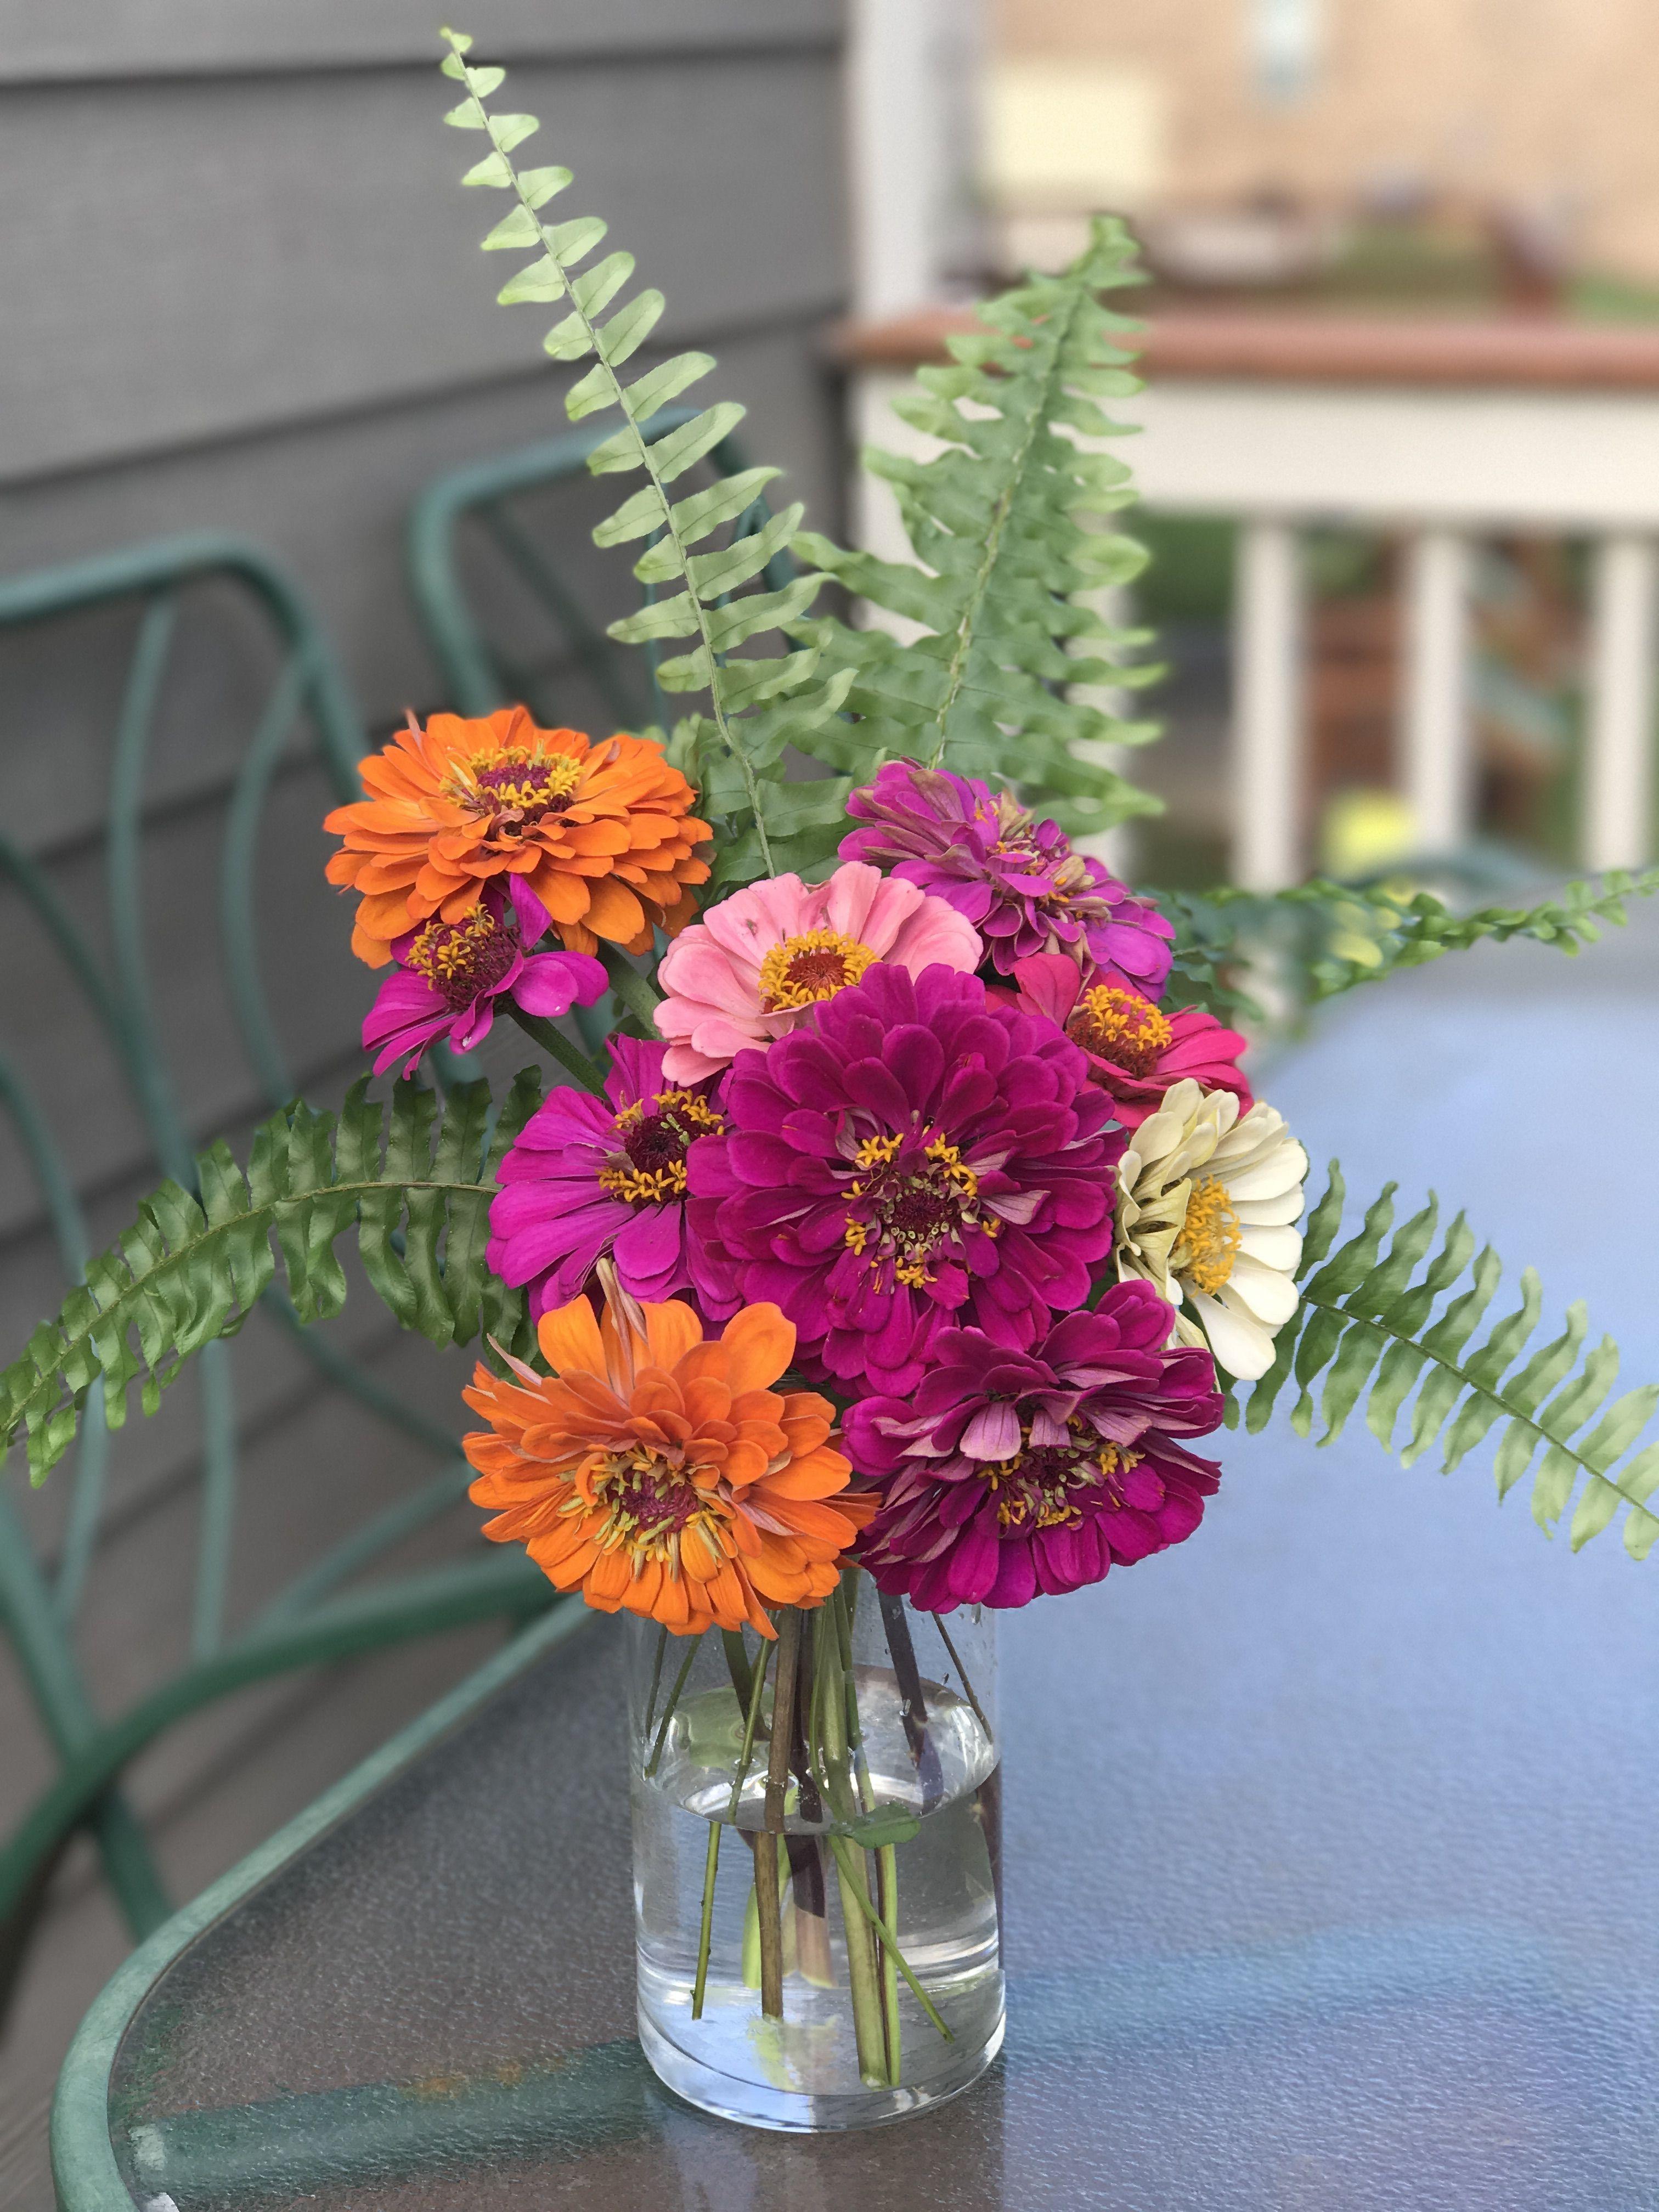 Zinnia Floral Arrangement Flower Vases Flower Arrangements Tulips Flowers